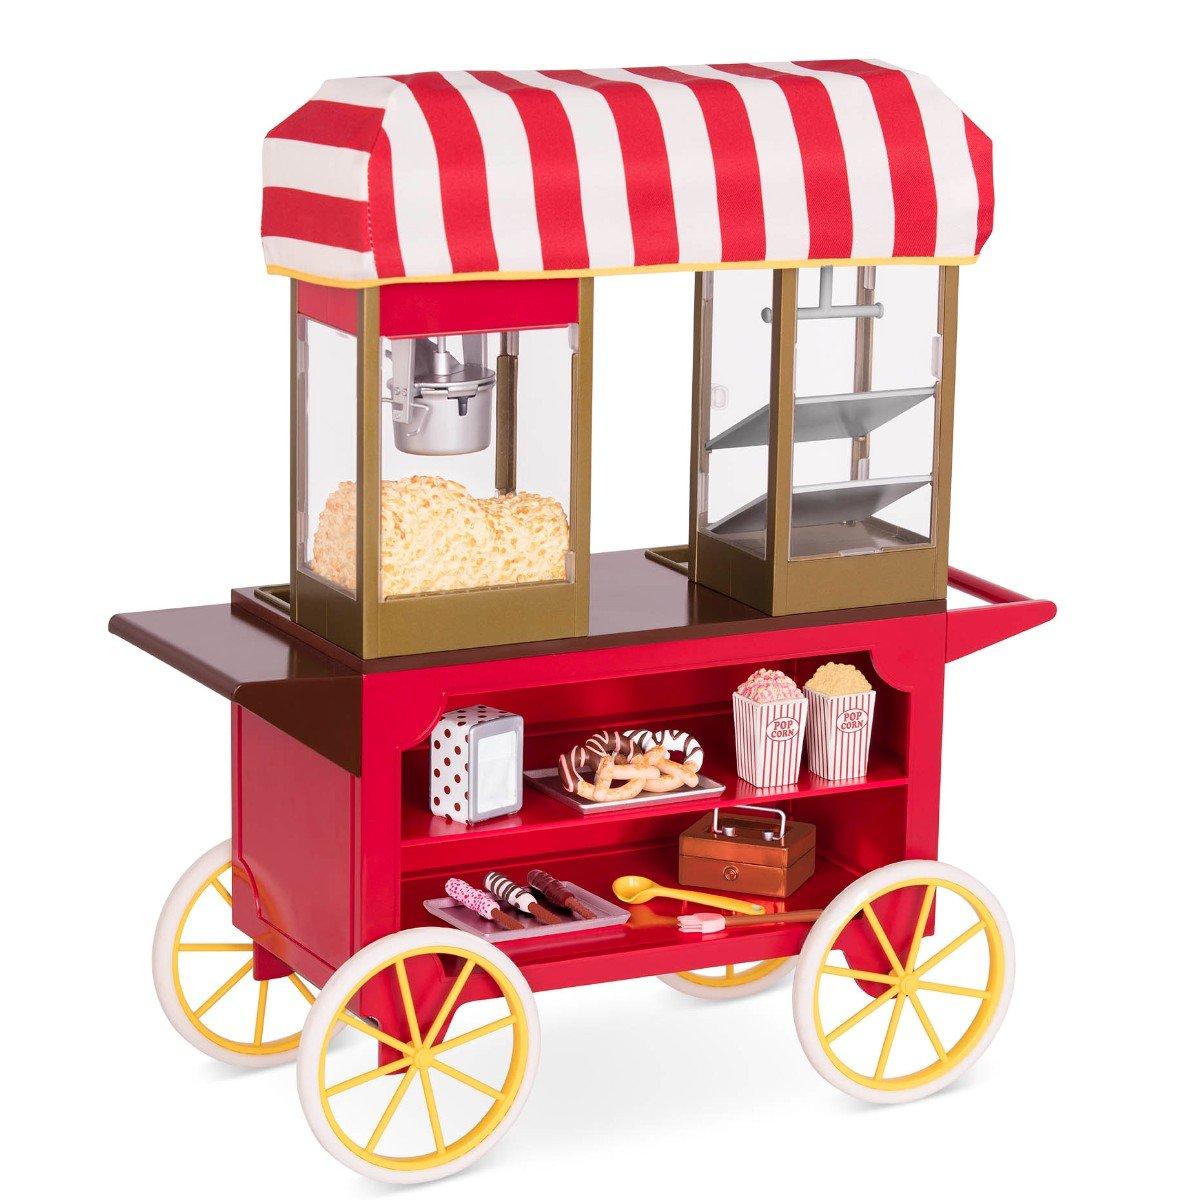 Our Generation - Poppin' Plenty Snack Cart (737931)